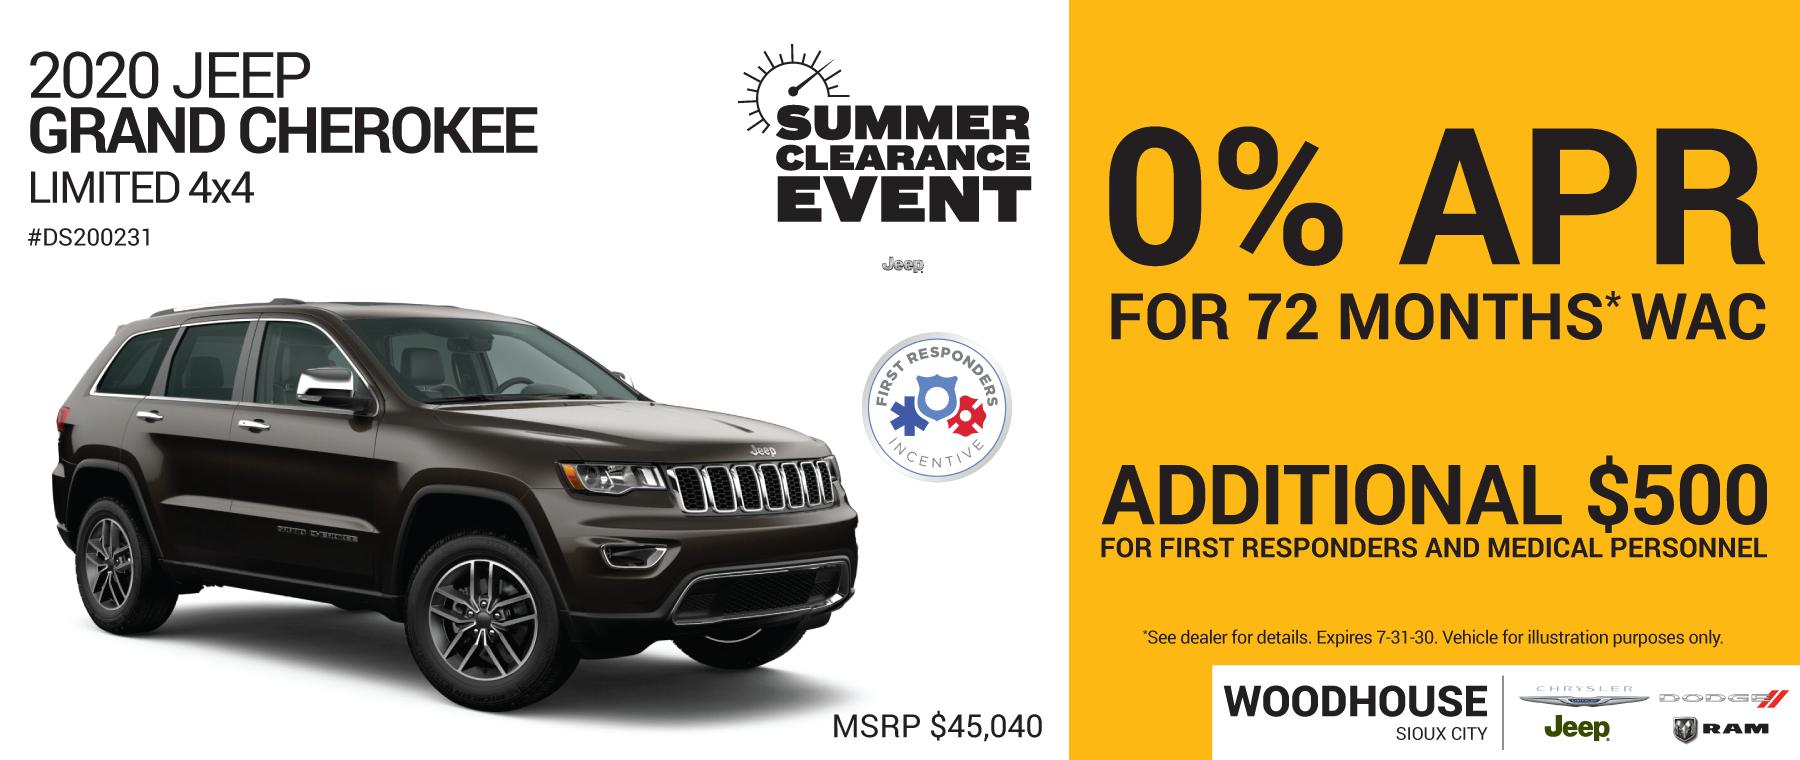 Woodhouse Chrysler Dodge Jeep RAM Sioux City | CDJR Dealer ...